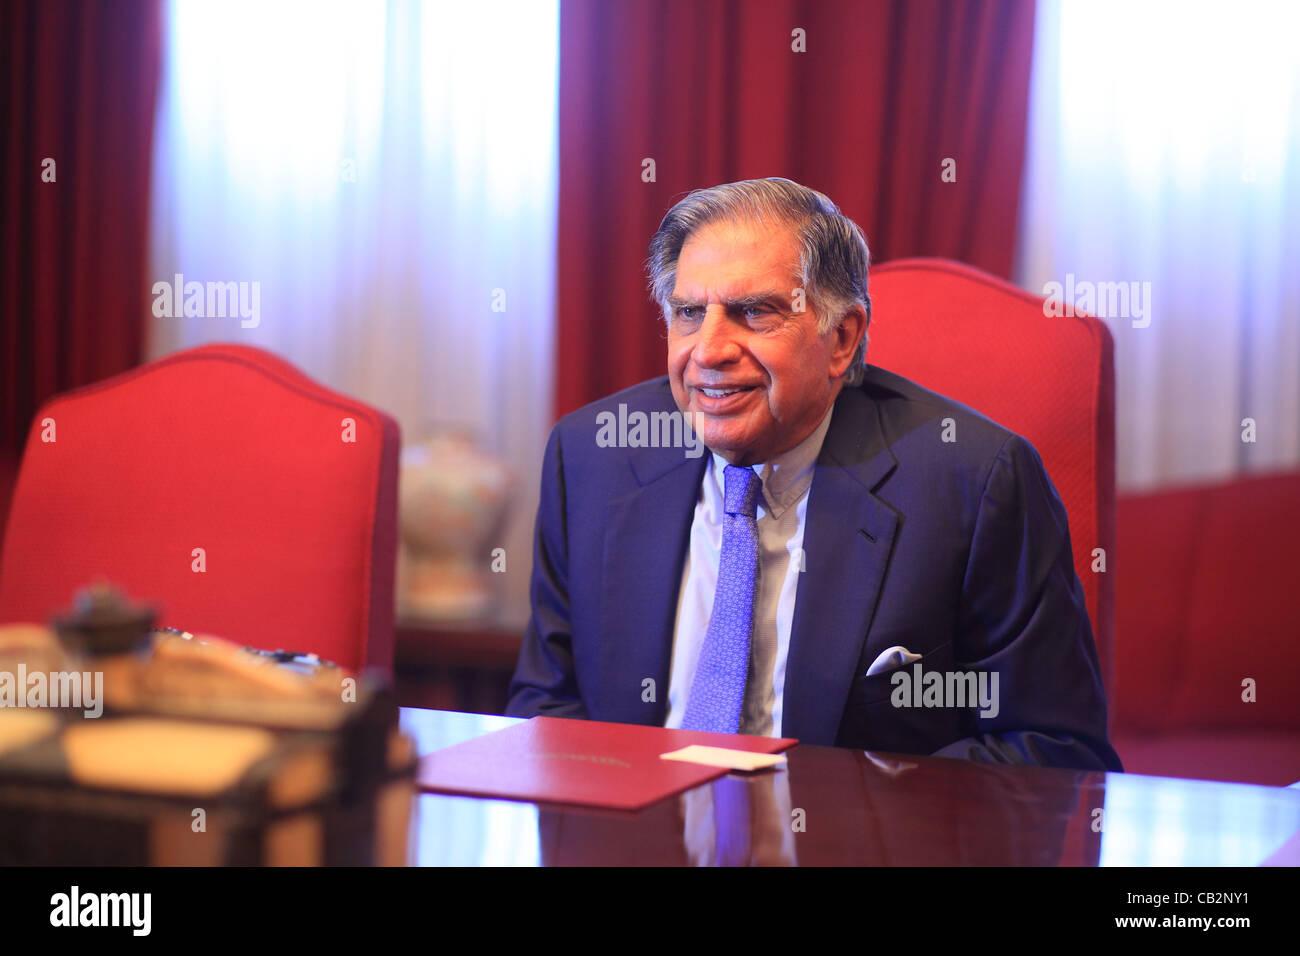 Mayo16,2012 - Mumbai, India : Retrato de Rata industrial indio Tata, Presidente de Tata empire en la Bombay House, Foto de stock